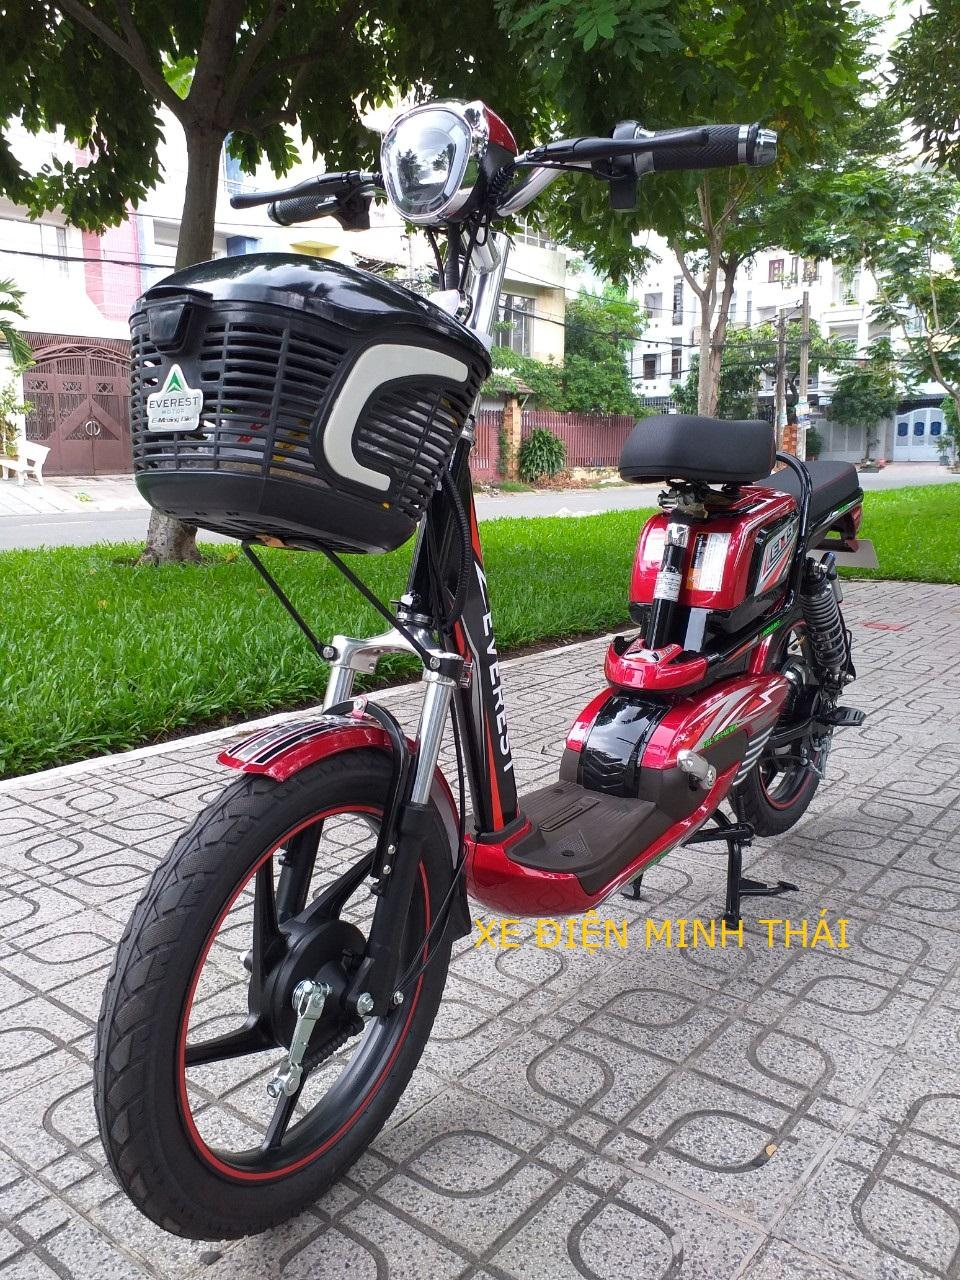 Mua xe đạp điện hiệu everest mẫu EM9 giá tốt- xe điện everest- xe máy điện everest mẫu mới